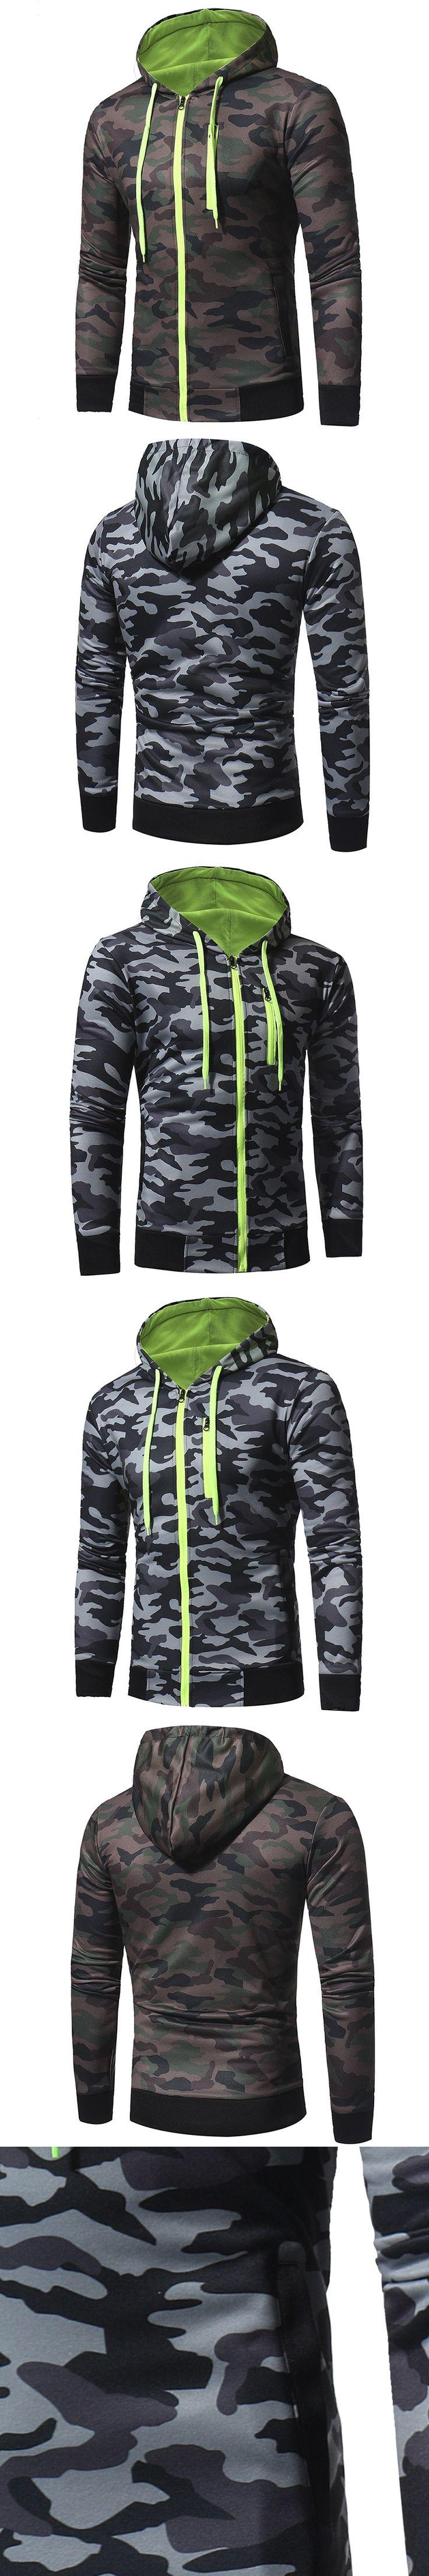 New Men Hooded Hoodies Plus Size Military Camouflage Sweatshirt Jacket Tactical Hoodie Coat Autumn Winter Male Top Tracksuit 3XL